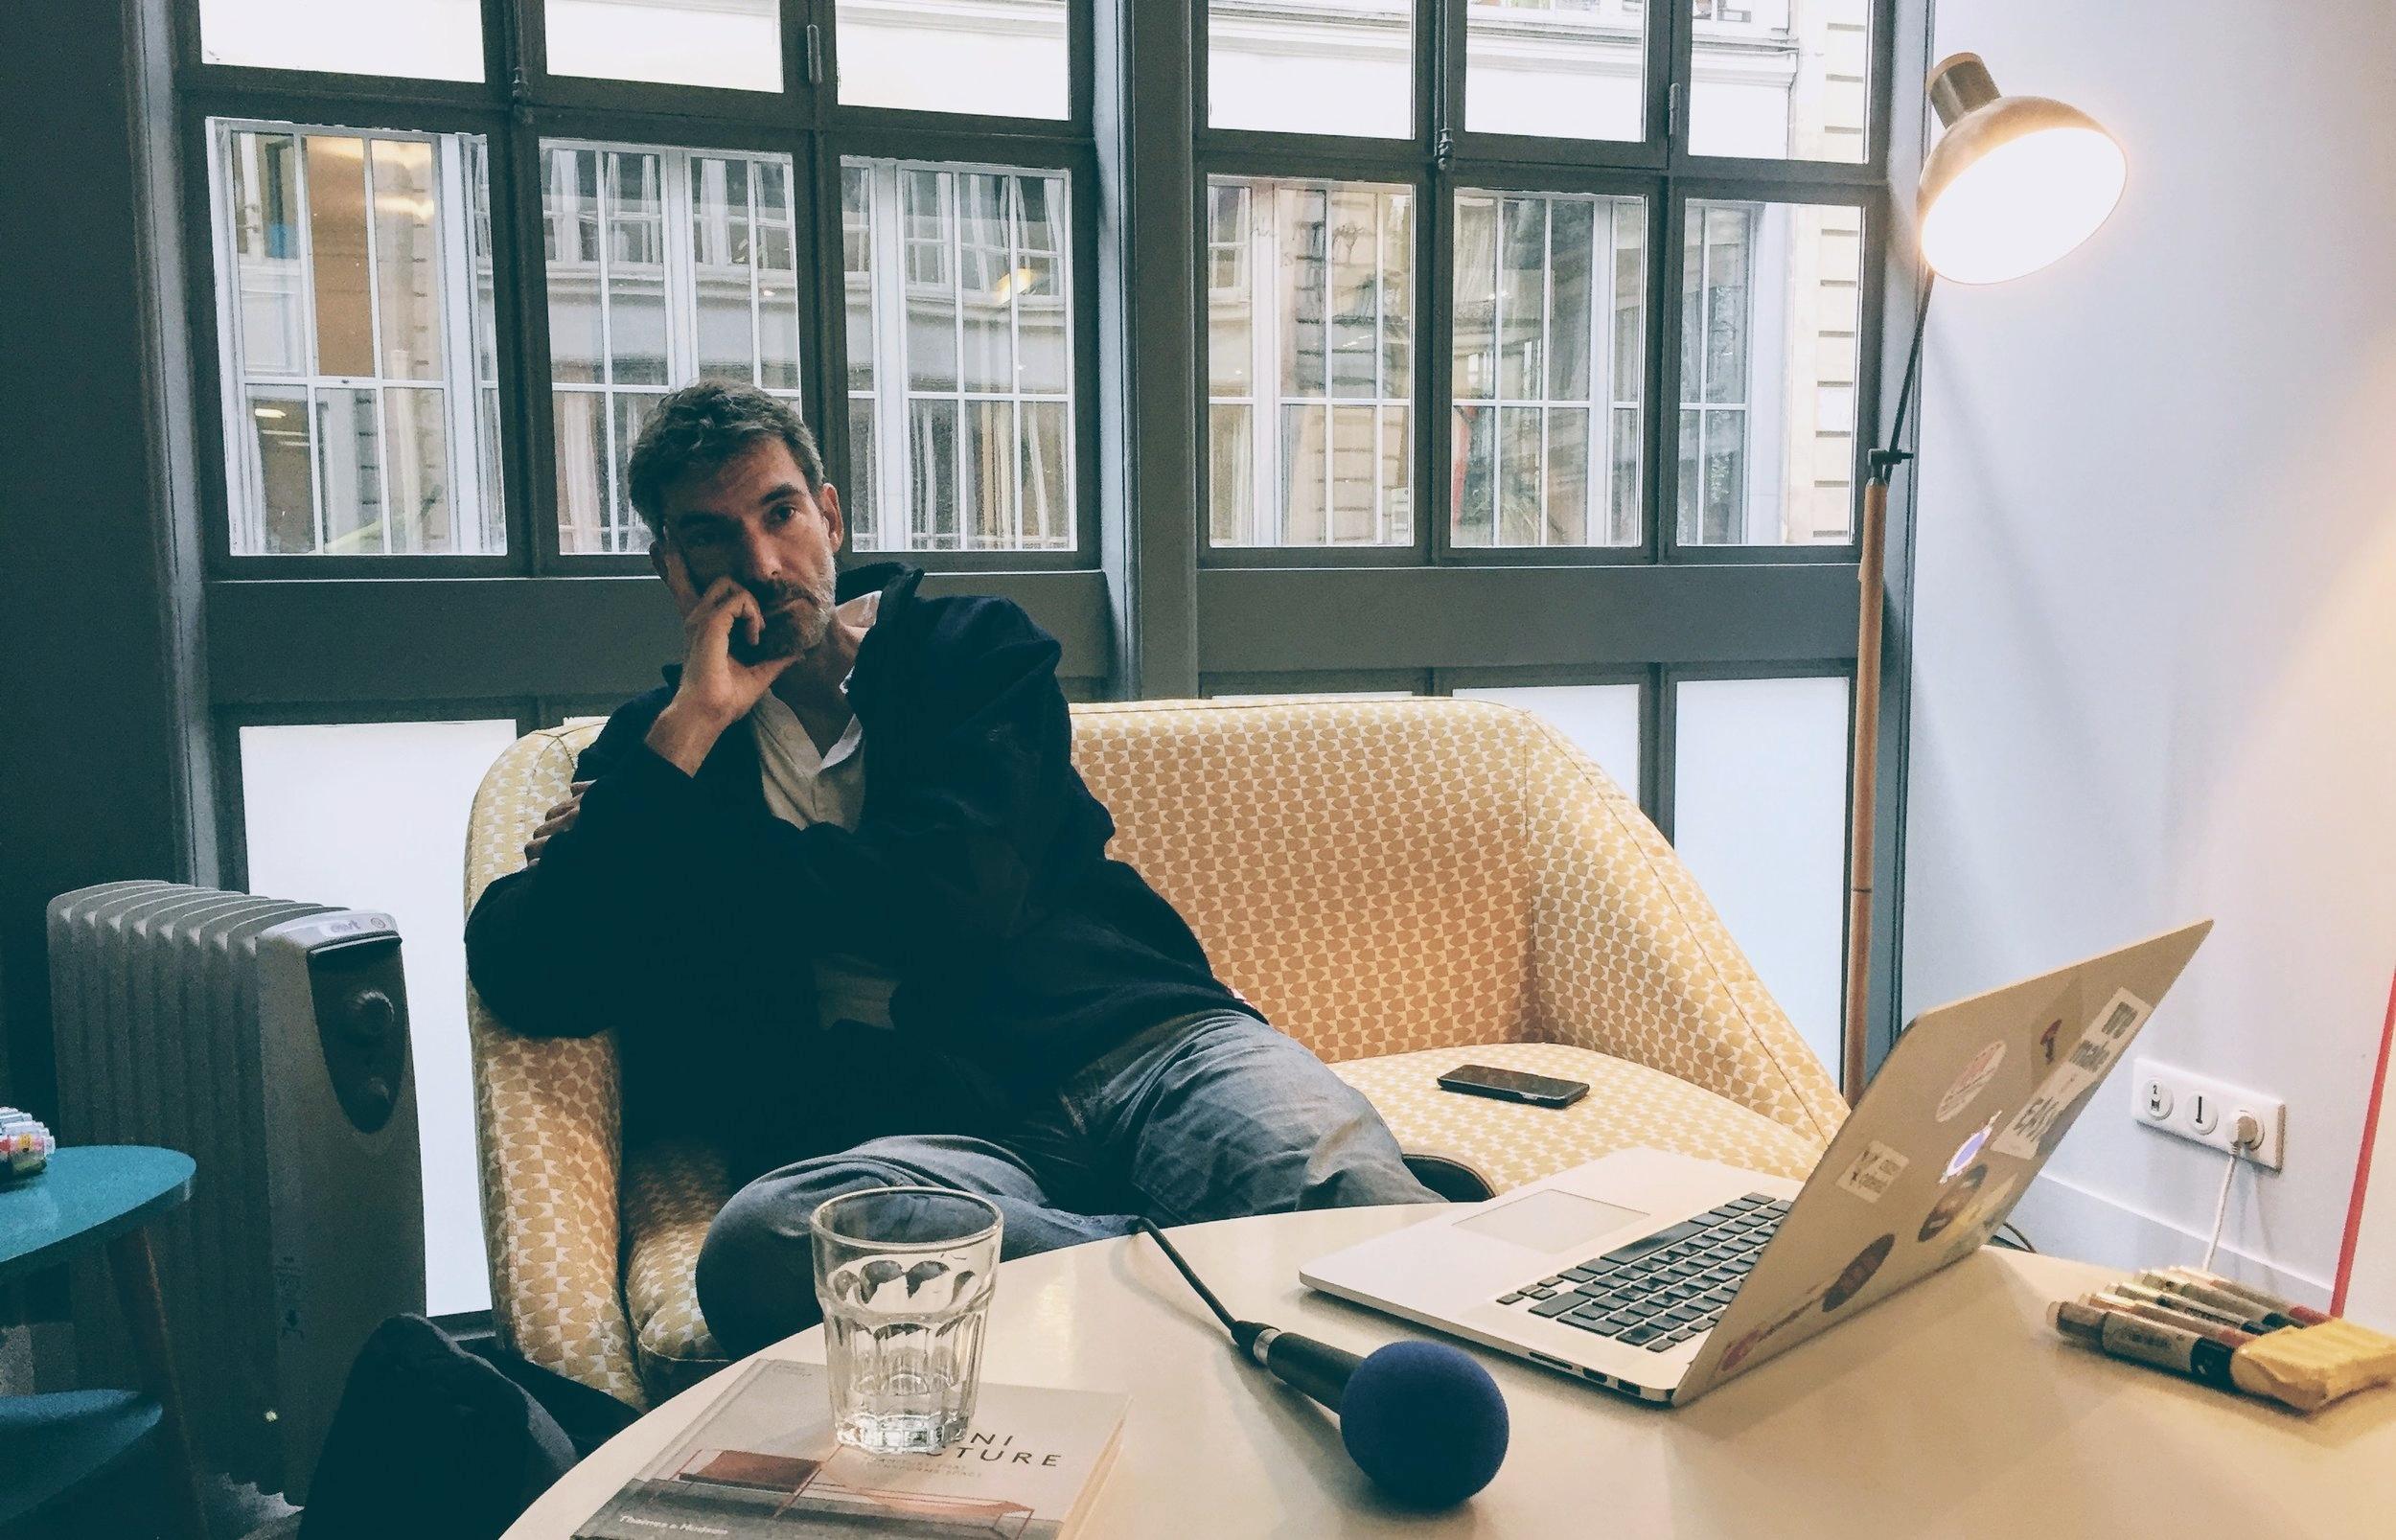 Greg Serikoff. Paris 09.10.17